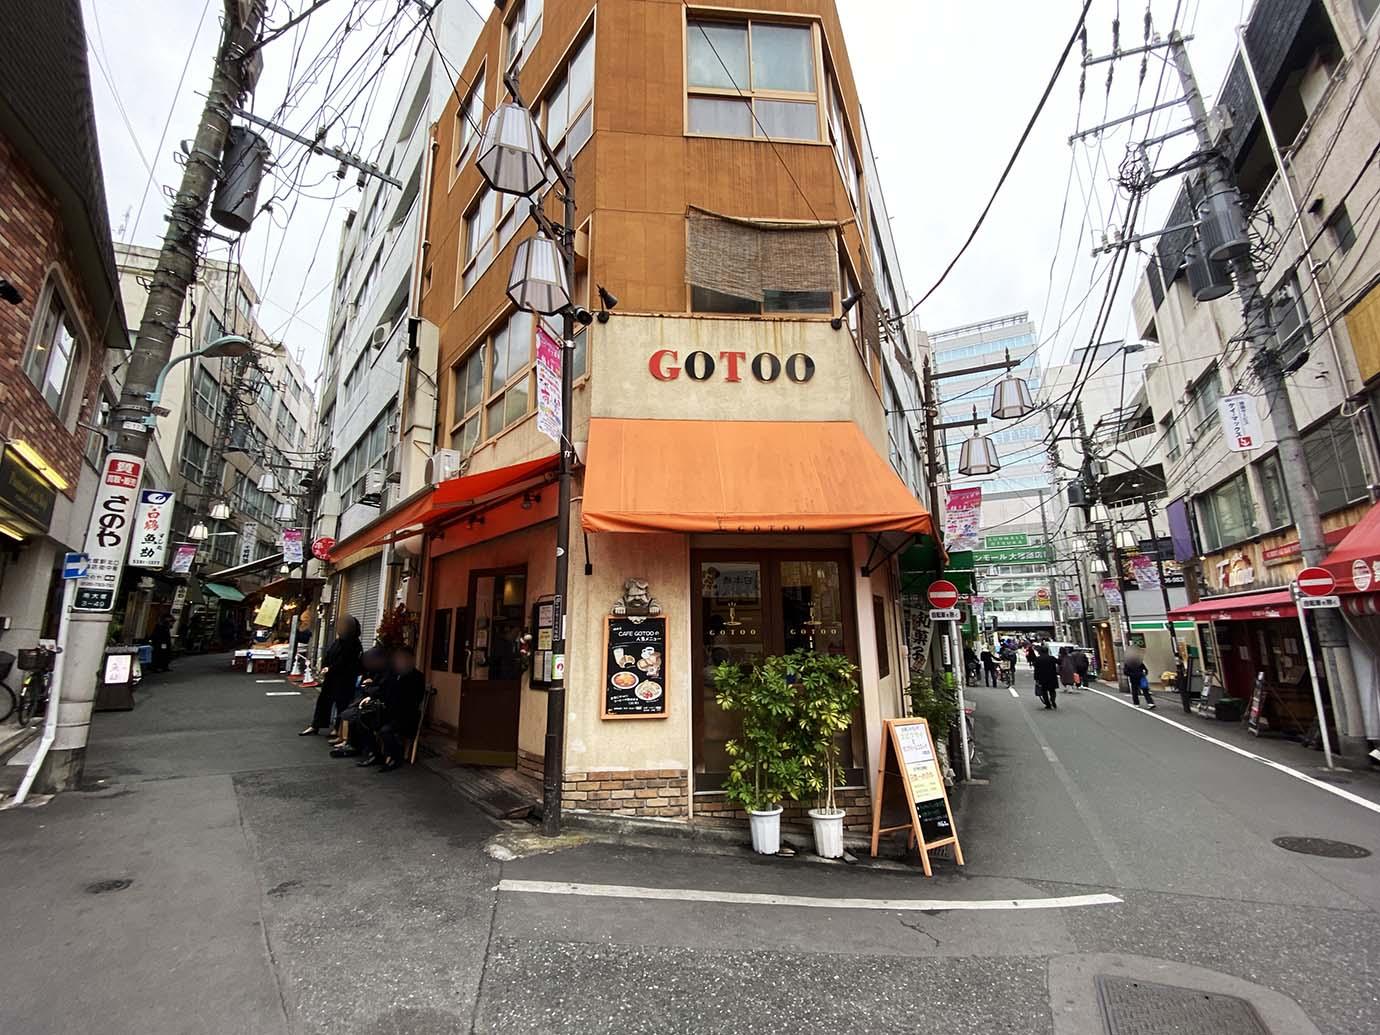 kakifurai-gotoo2